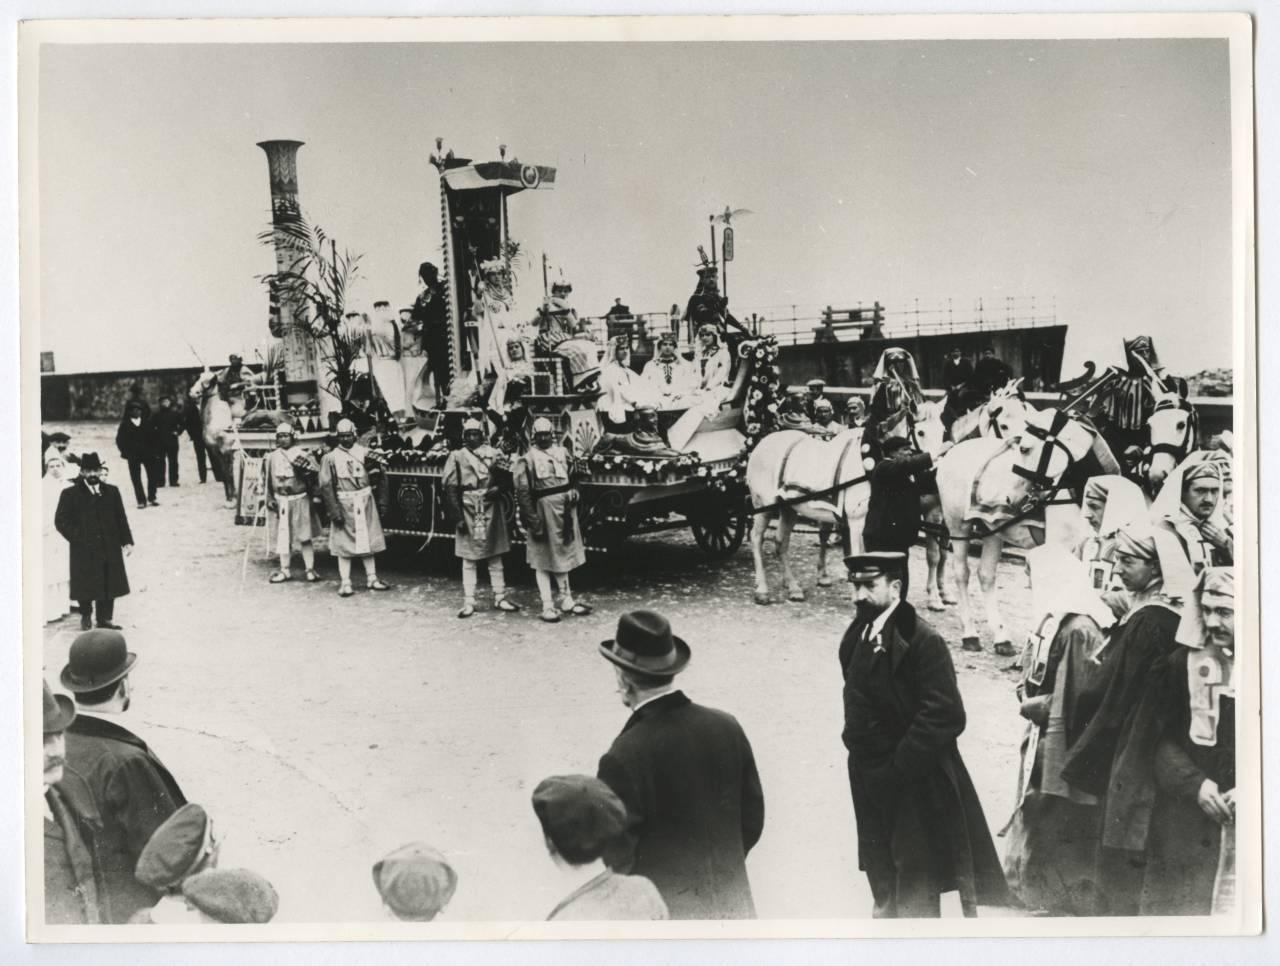 Carroza de un carnaval